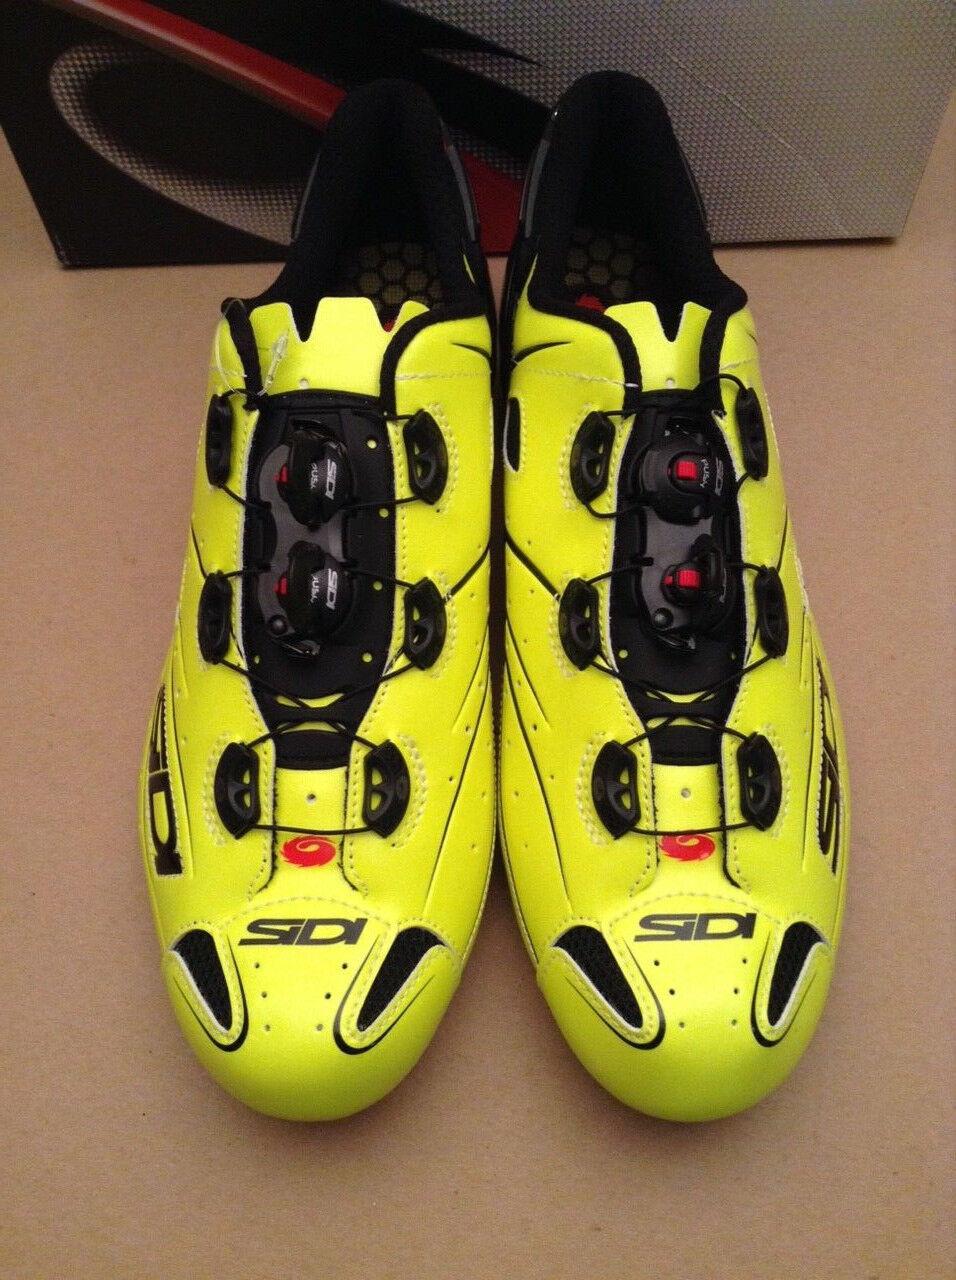 Sidi Shot Glow Yellow Carbon Cycling shoes White US 10.5 New